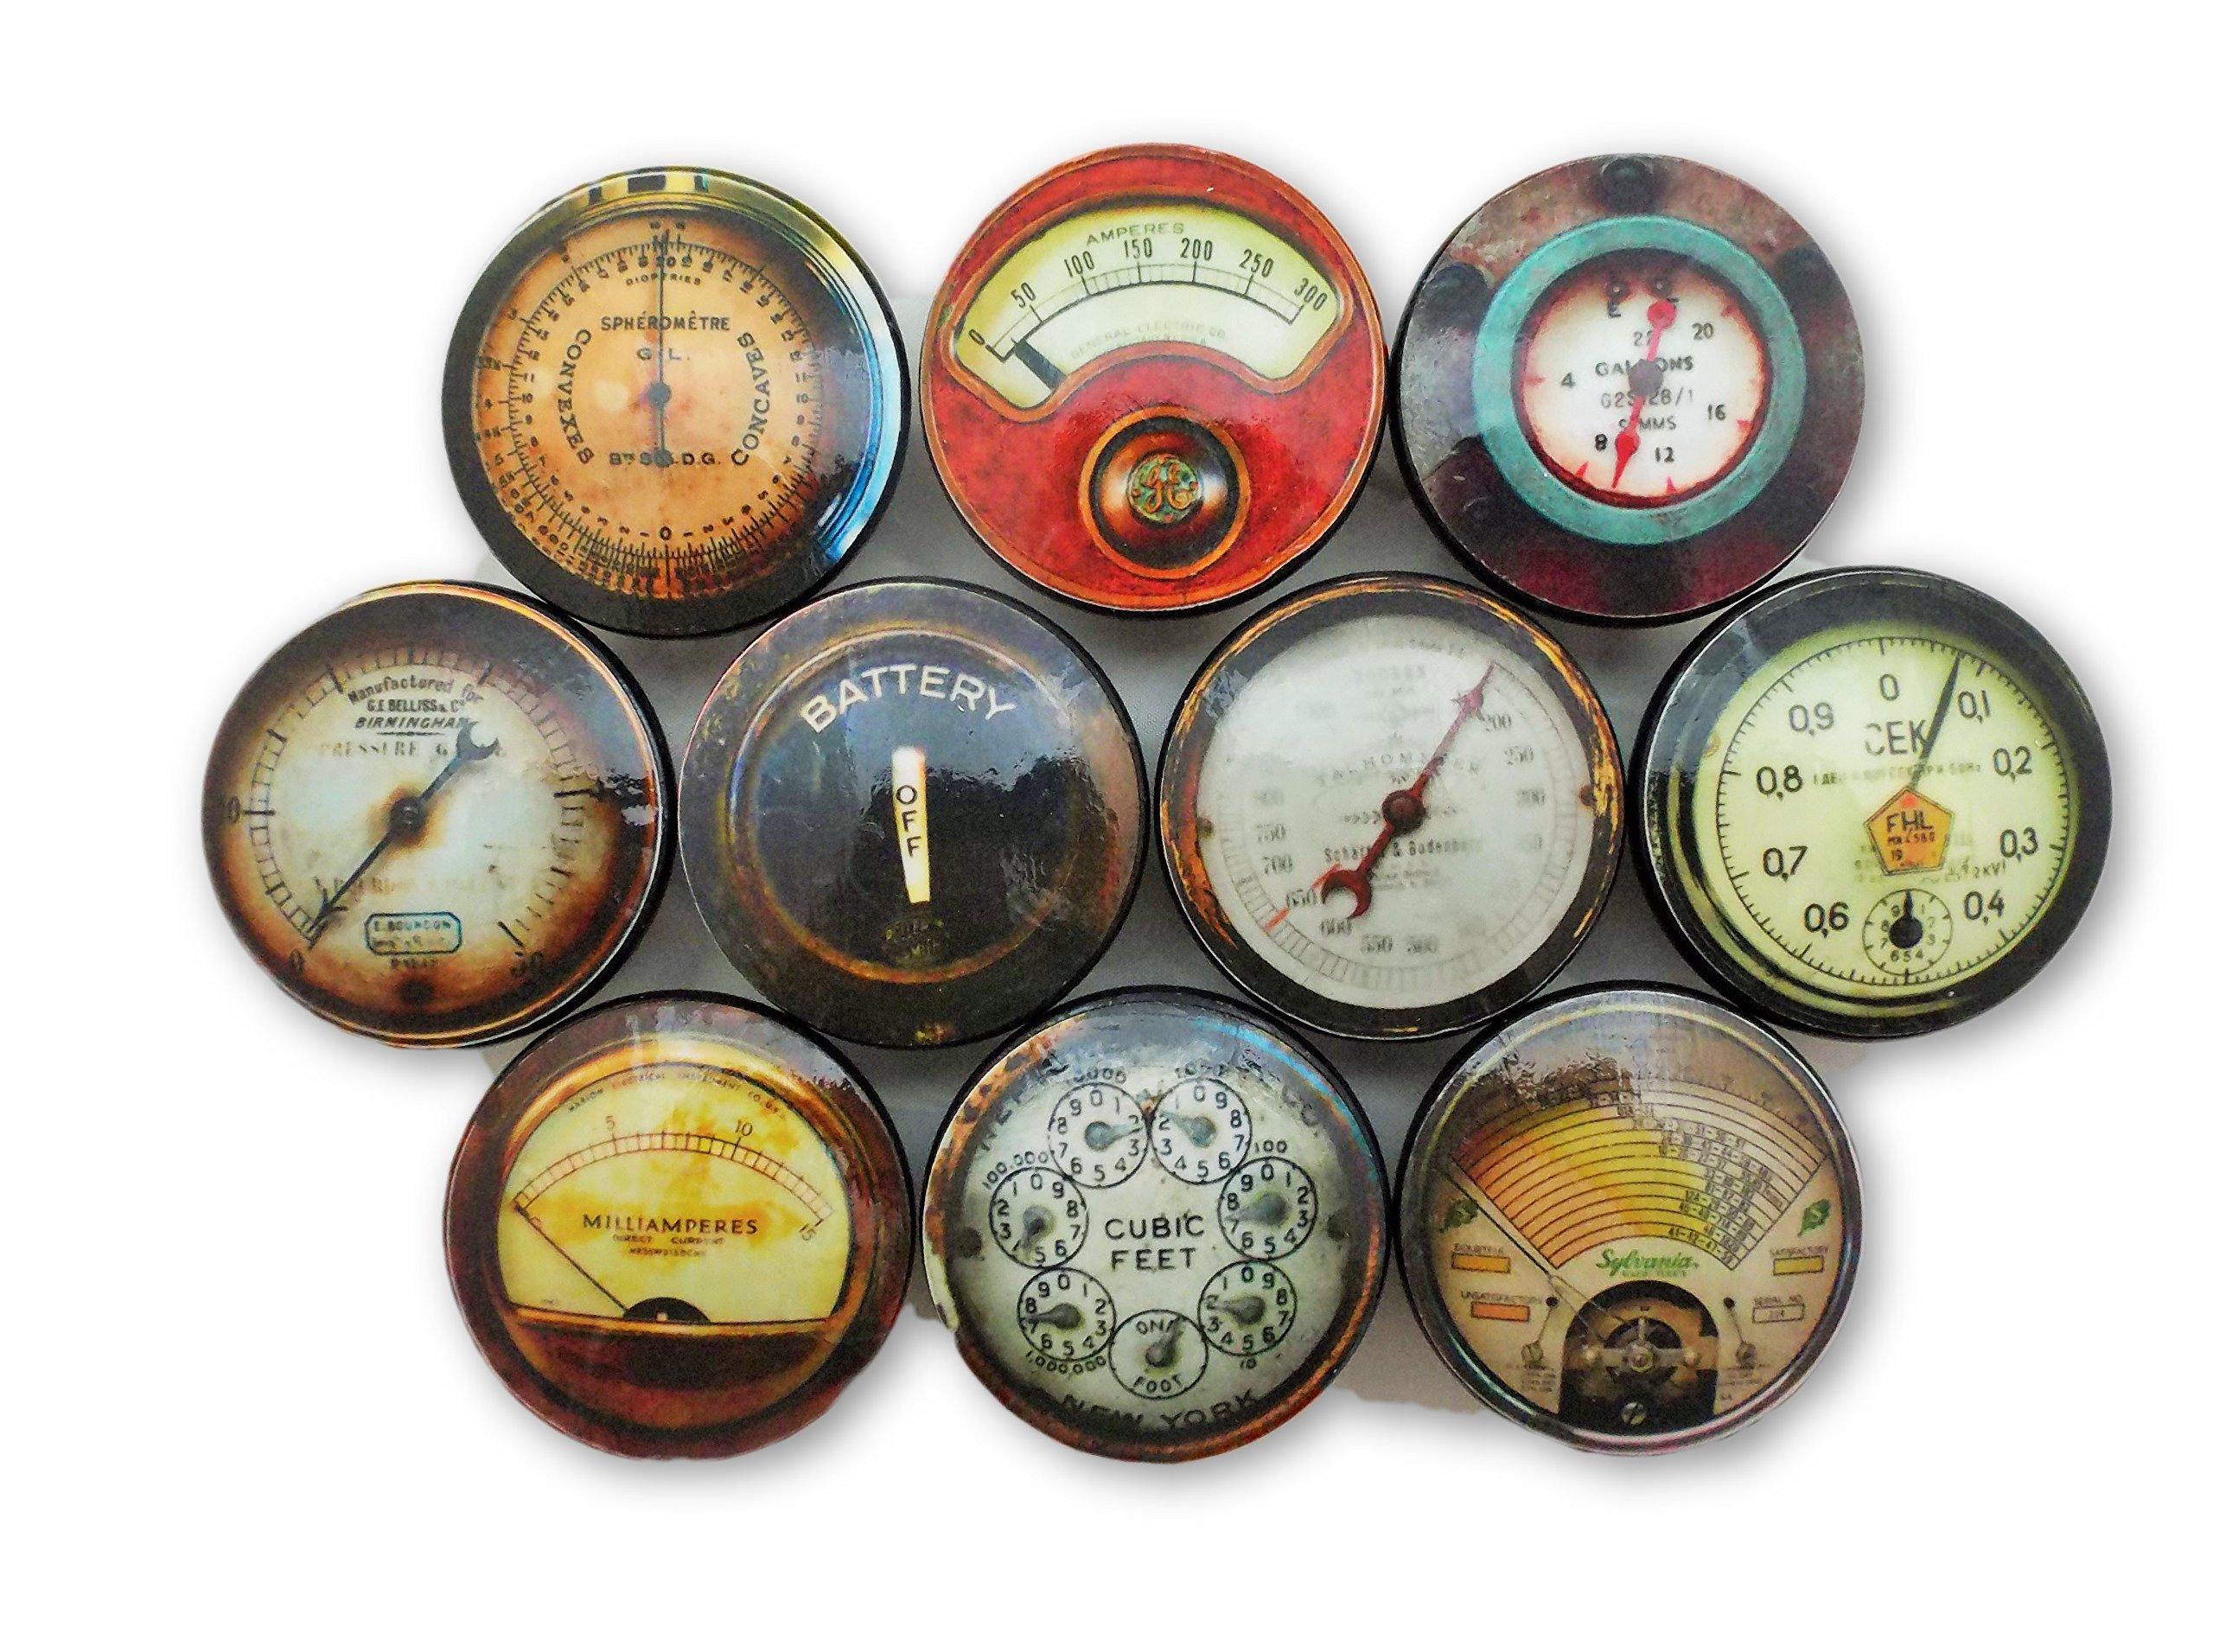 Set of 10 Industrial Meters and Gauges Wood Cabinet Knobs (Set 1)